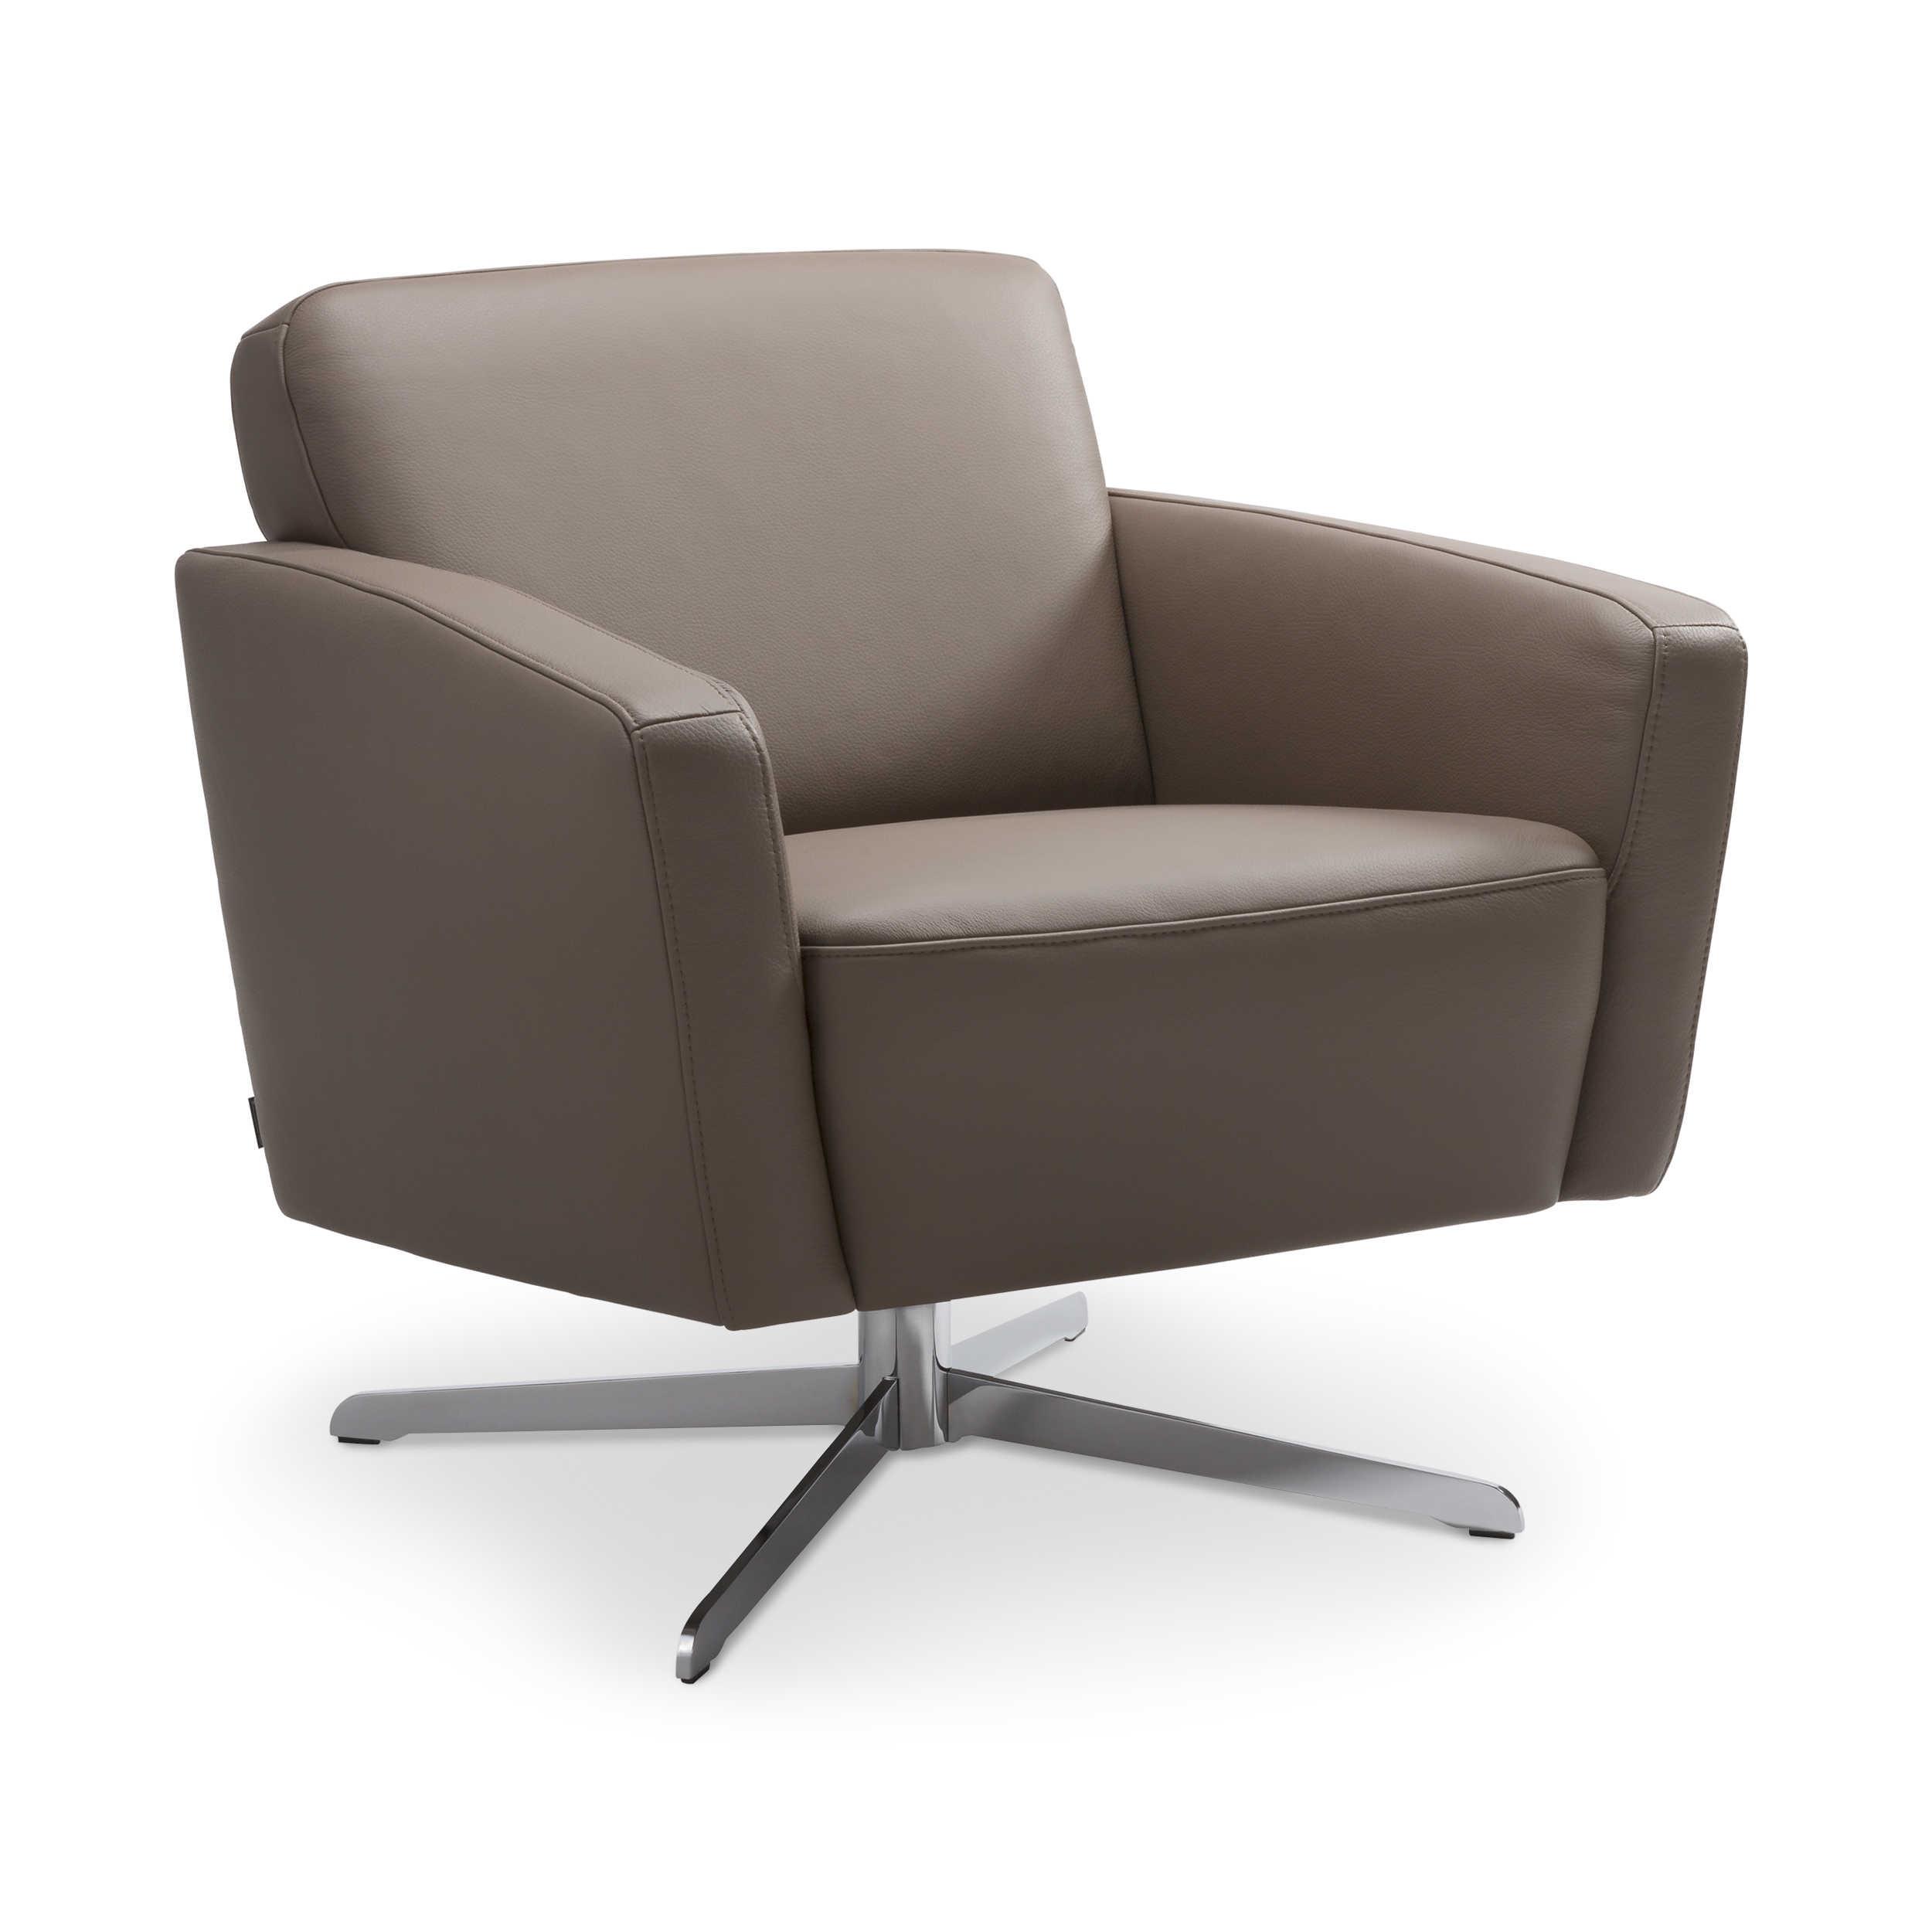 gallery m sessel emilia braun leder online kaufen bei woonio. Black Bedroom Furniture Sets. Home Design Ideas